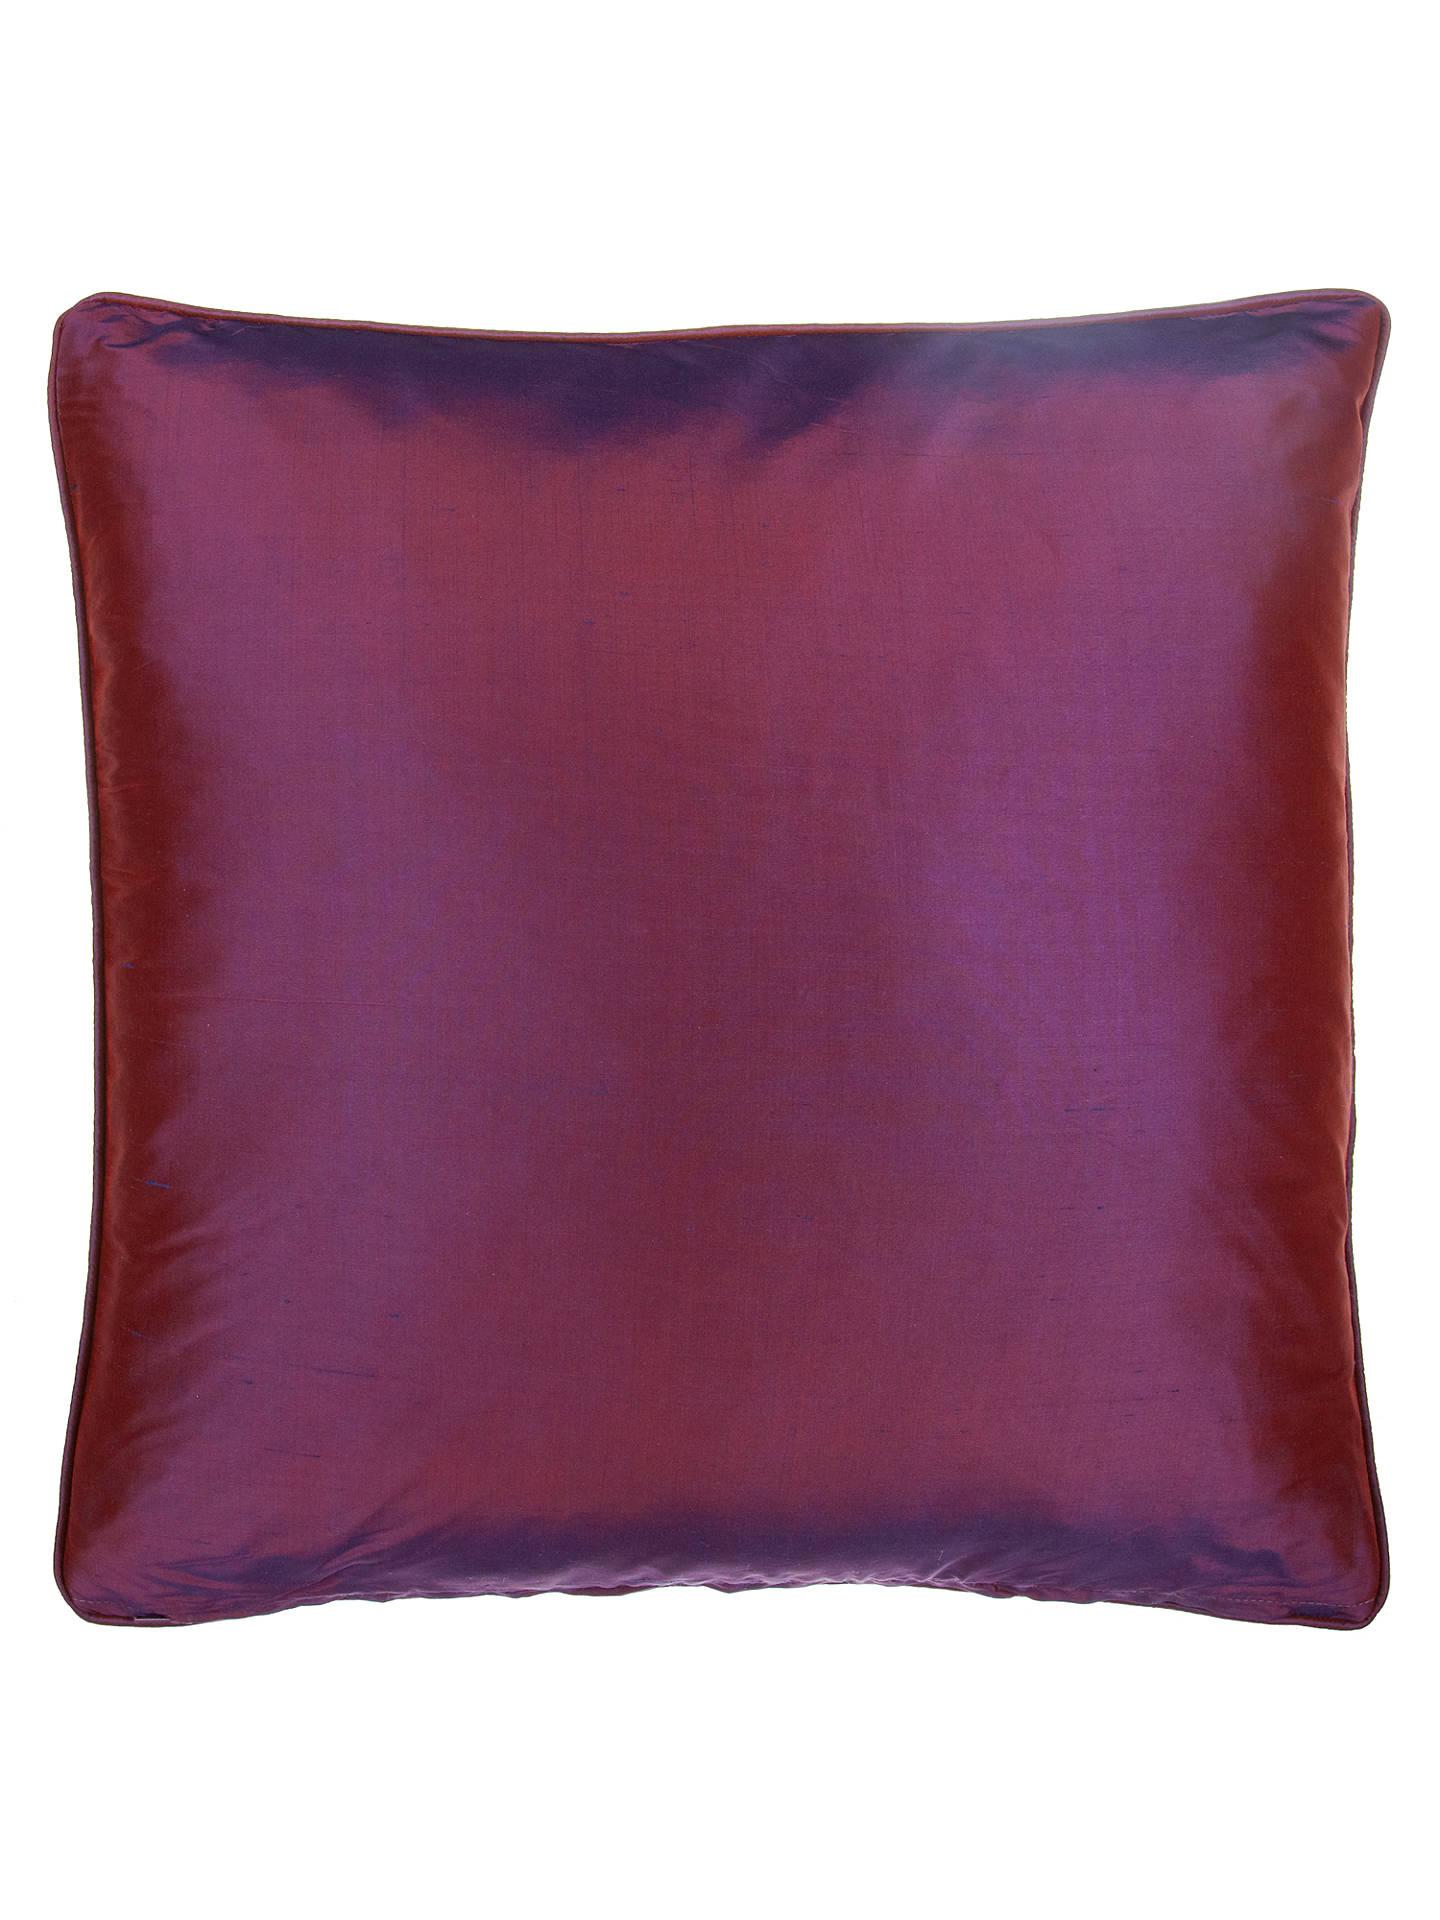 john lewis silk cushion fig at john lewis partners. Black Bedroom Furniture Sets. Home Design Ideas